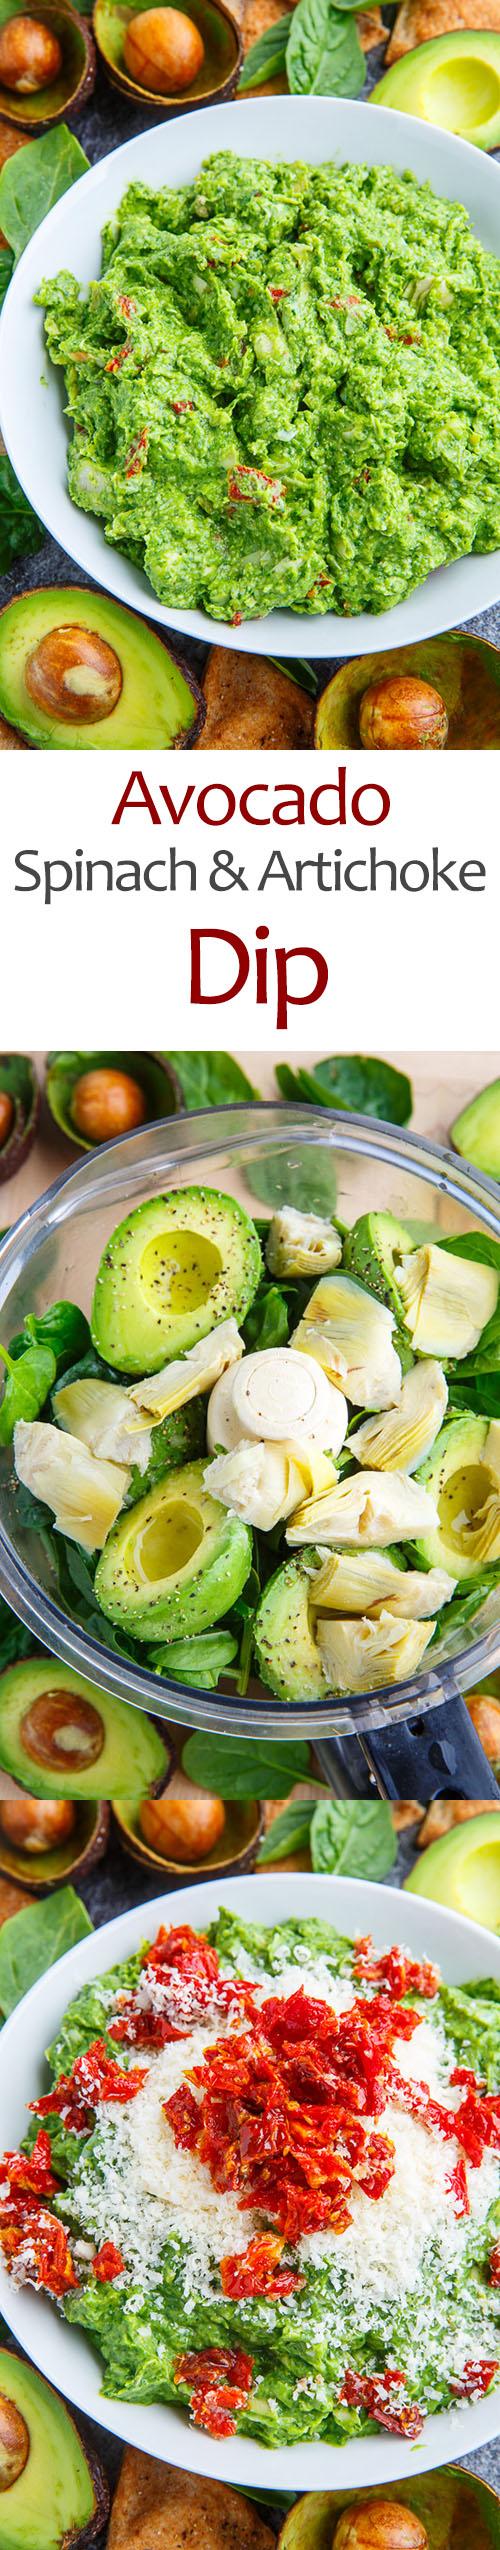 Avocado Spinach and Artichoke Dip